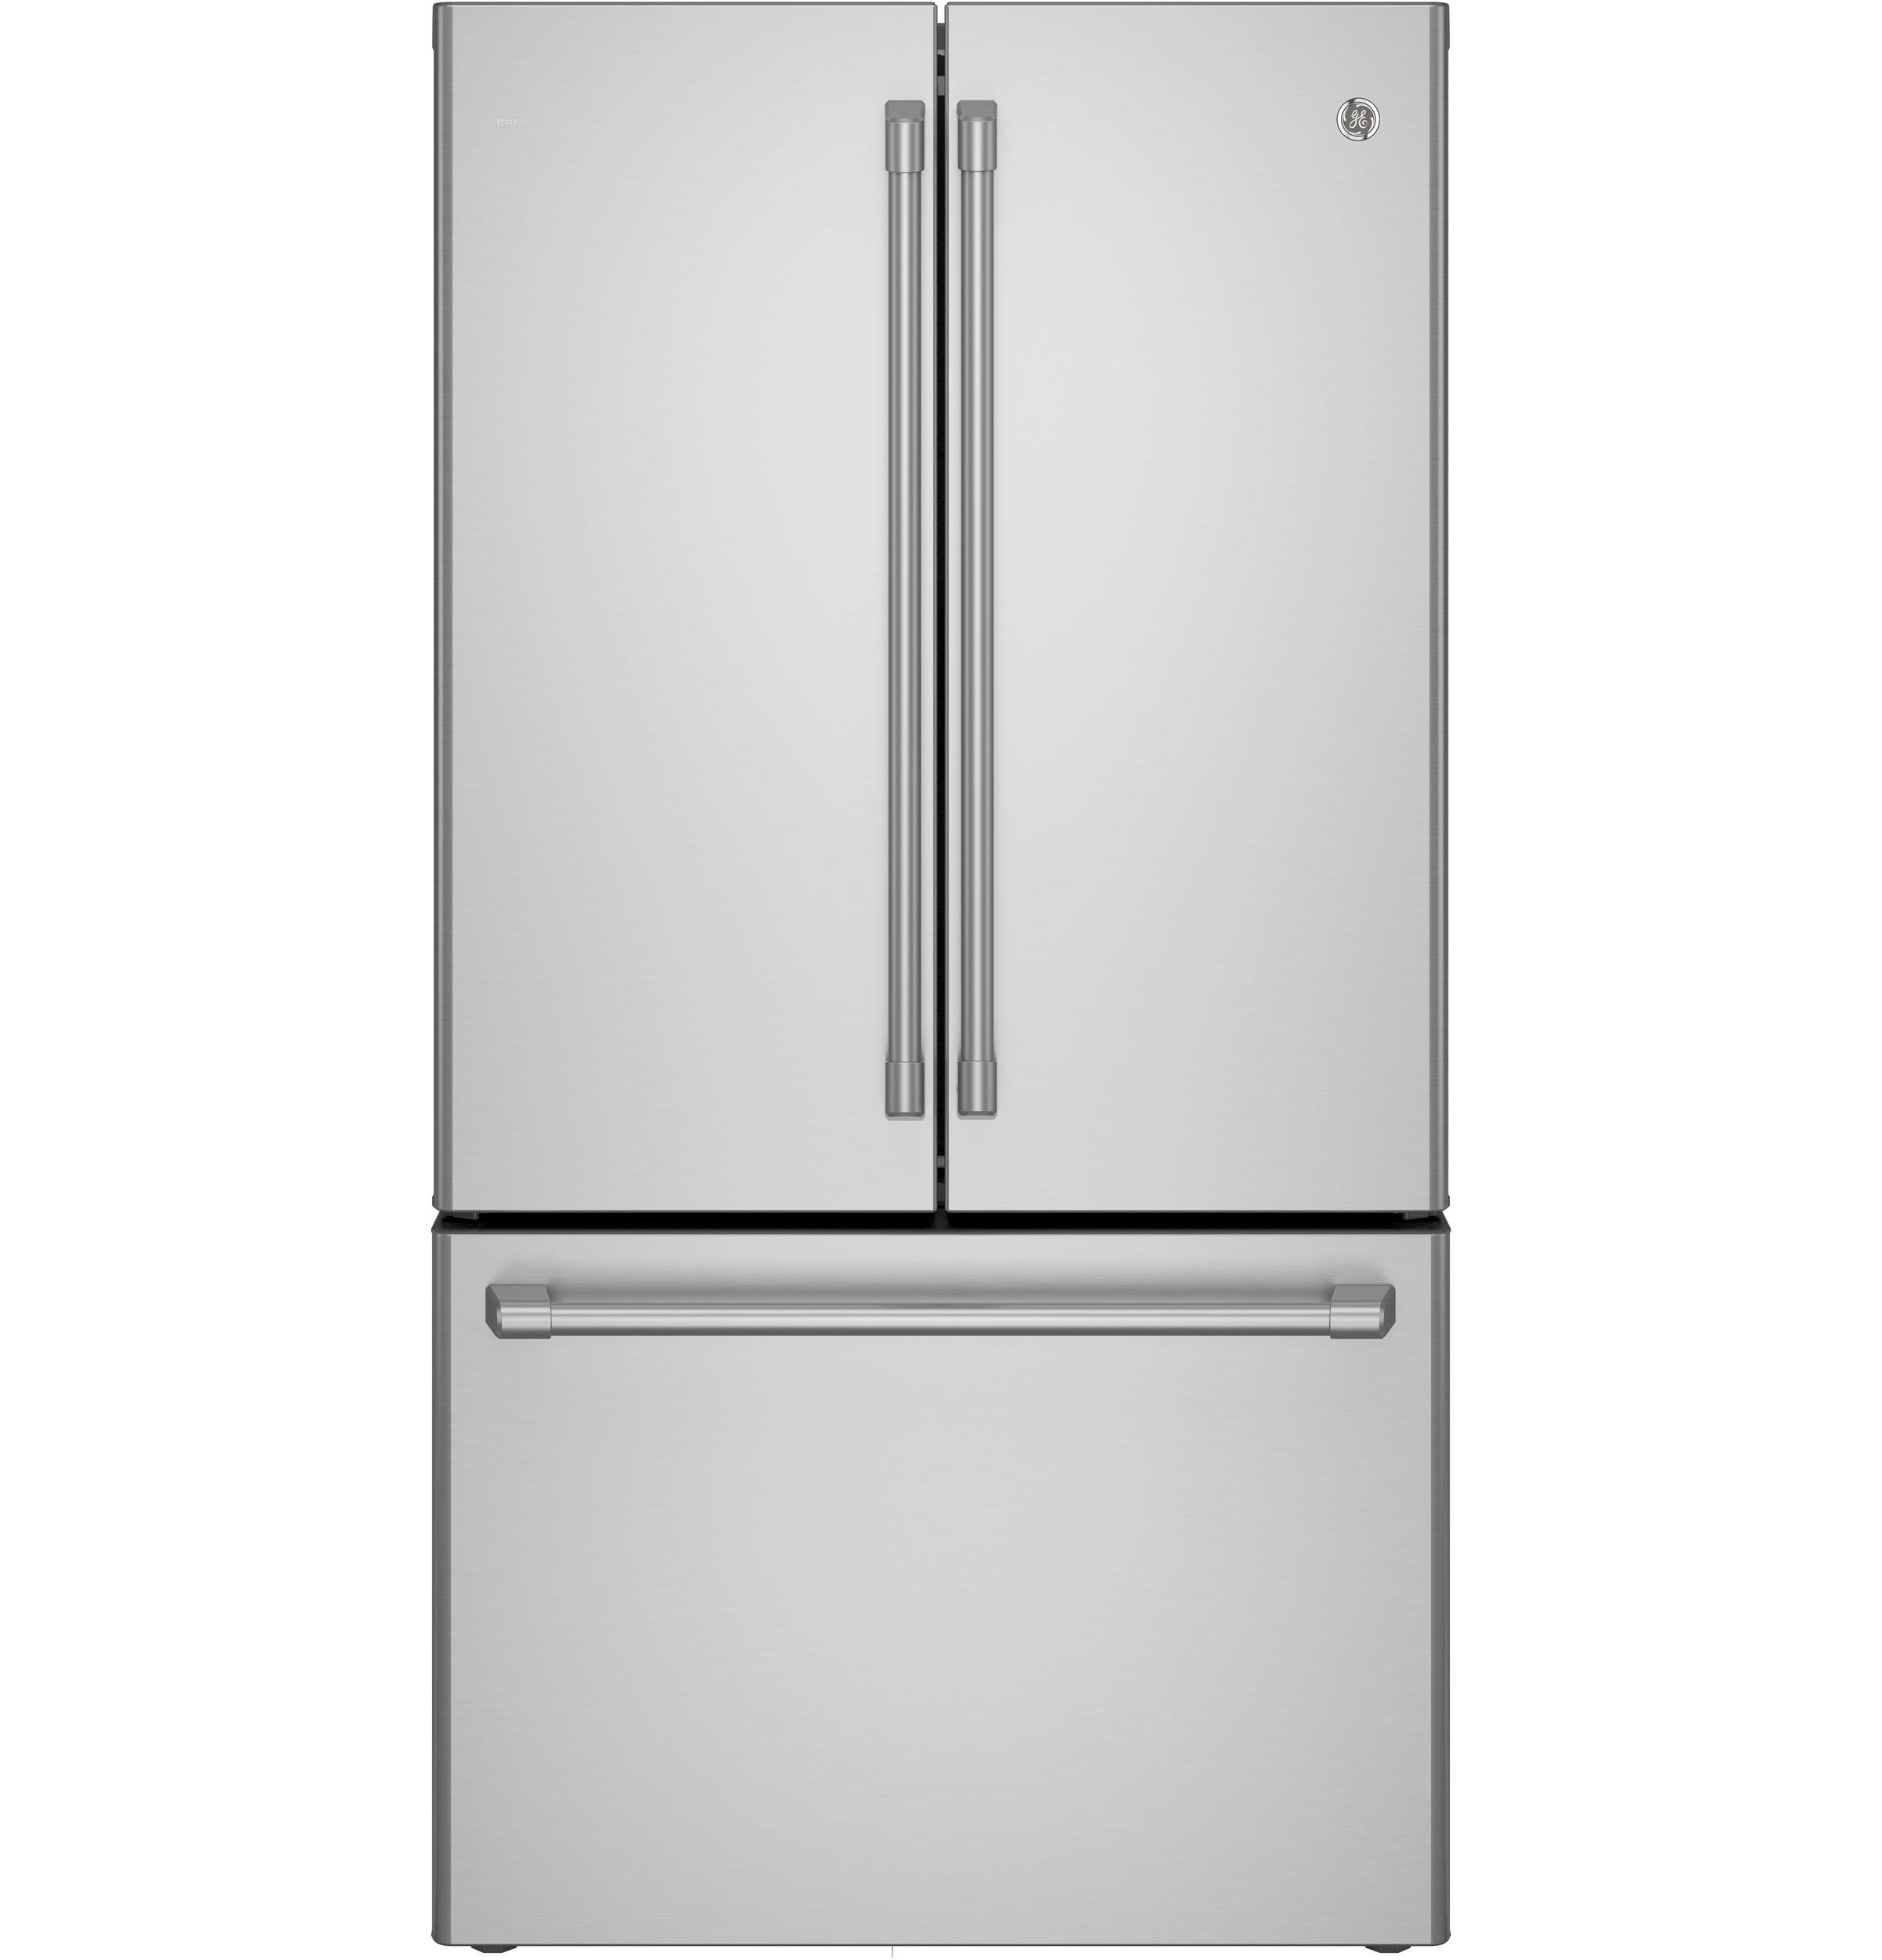 GE Cafe GE Café™ Series ENERGY STAR® 23.1 Cu. Ft. Counter-Depth French-Door Refrigerator